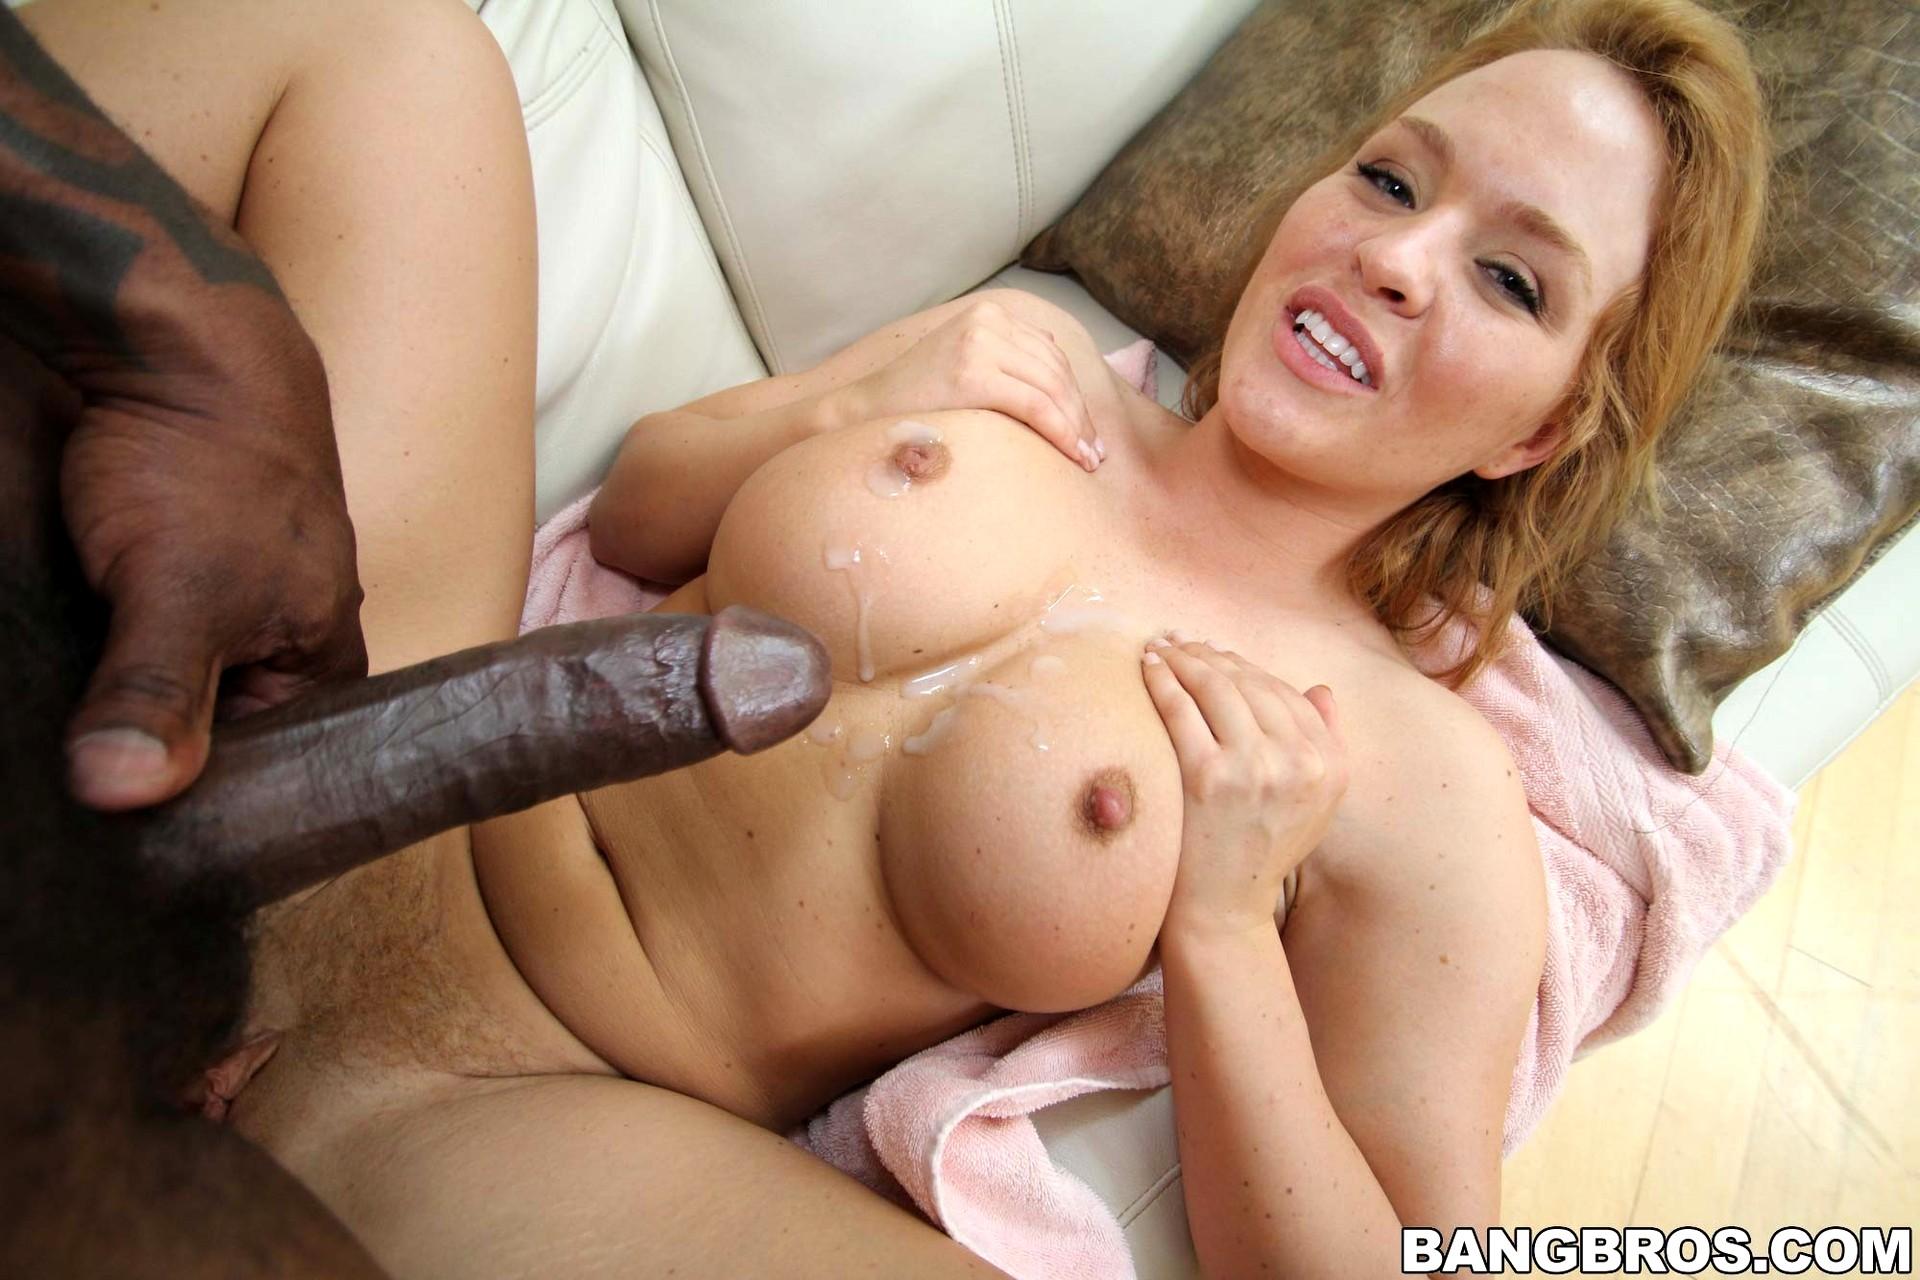 Big Cock Black Blonde Milf And Sucks Hot Fucks Something Is